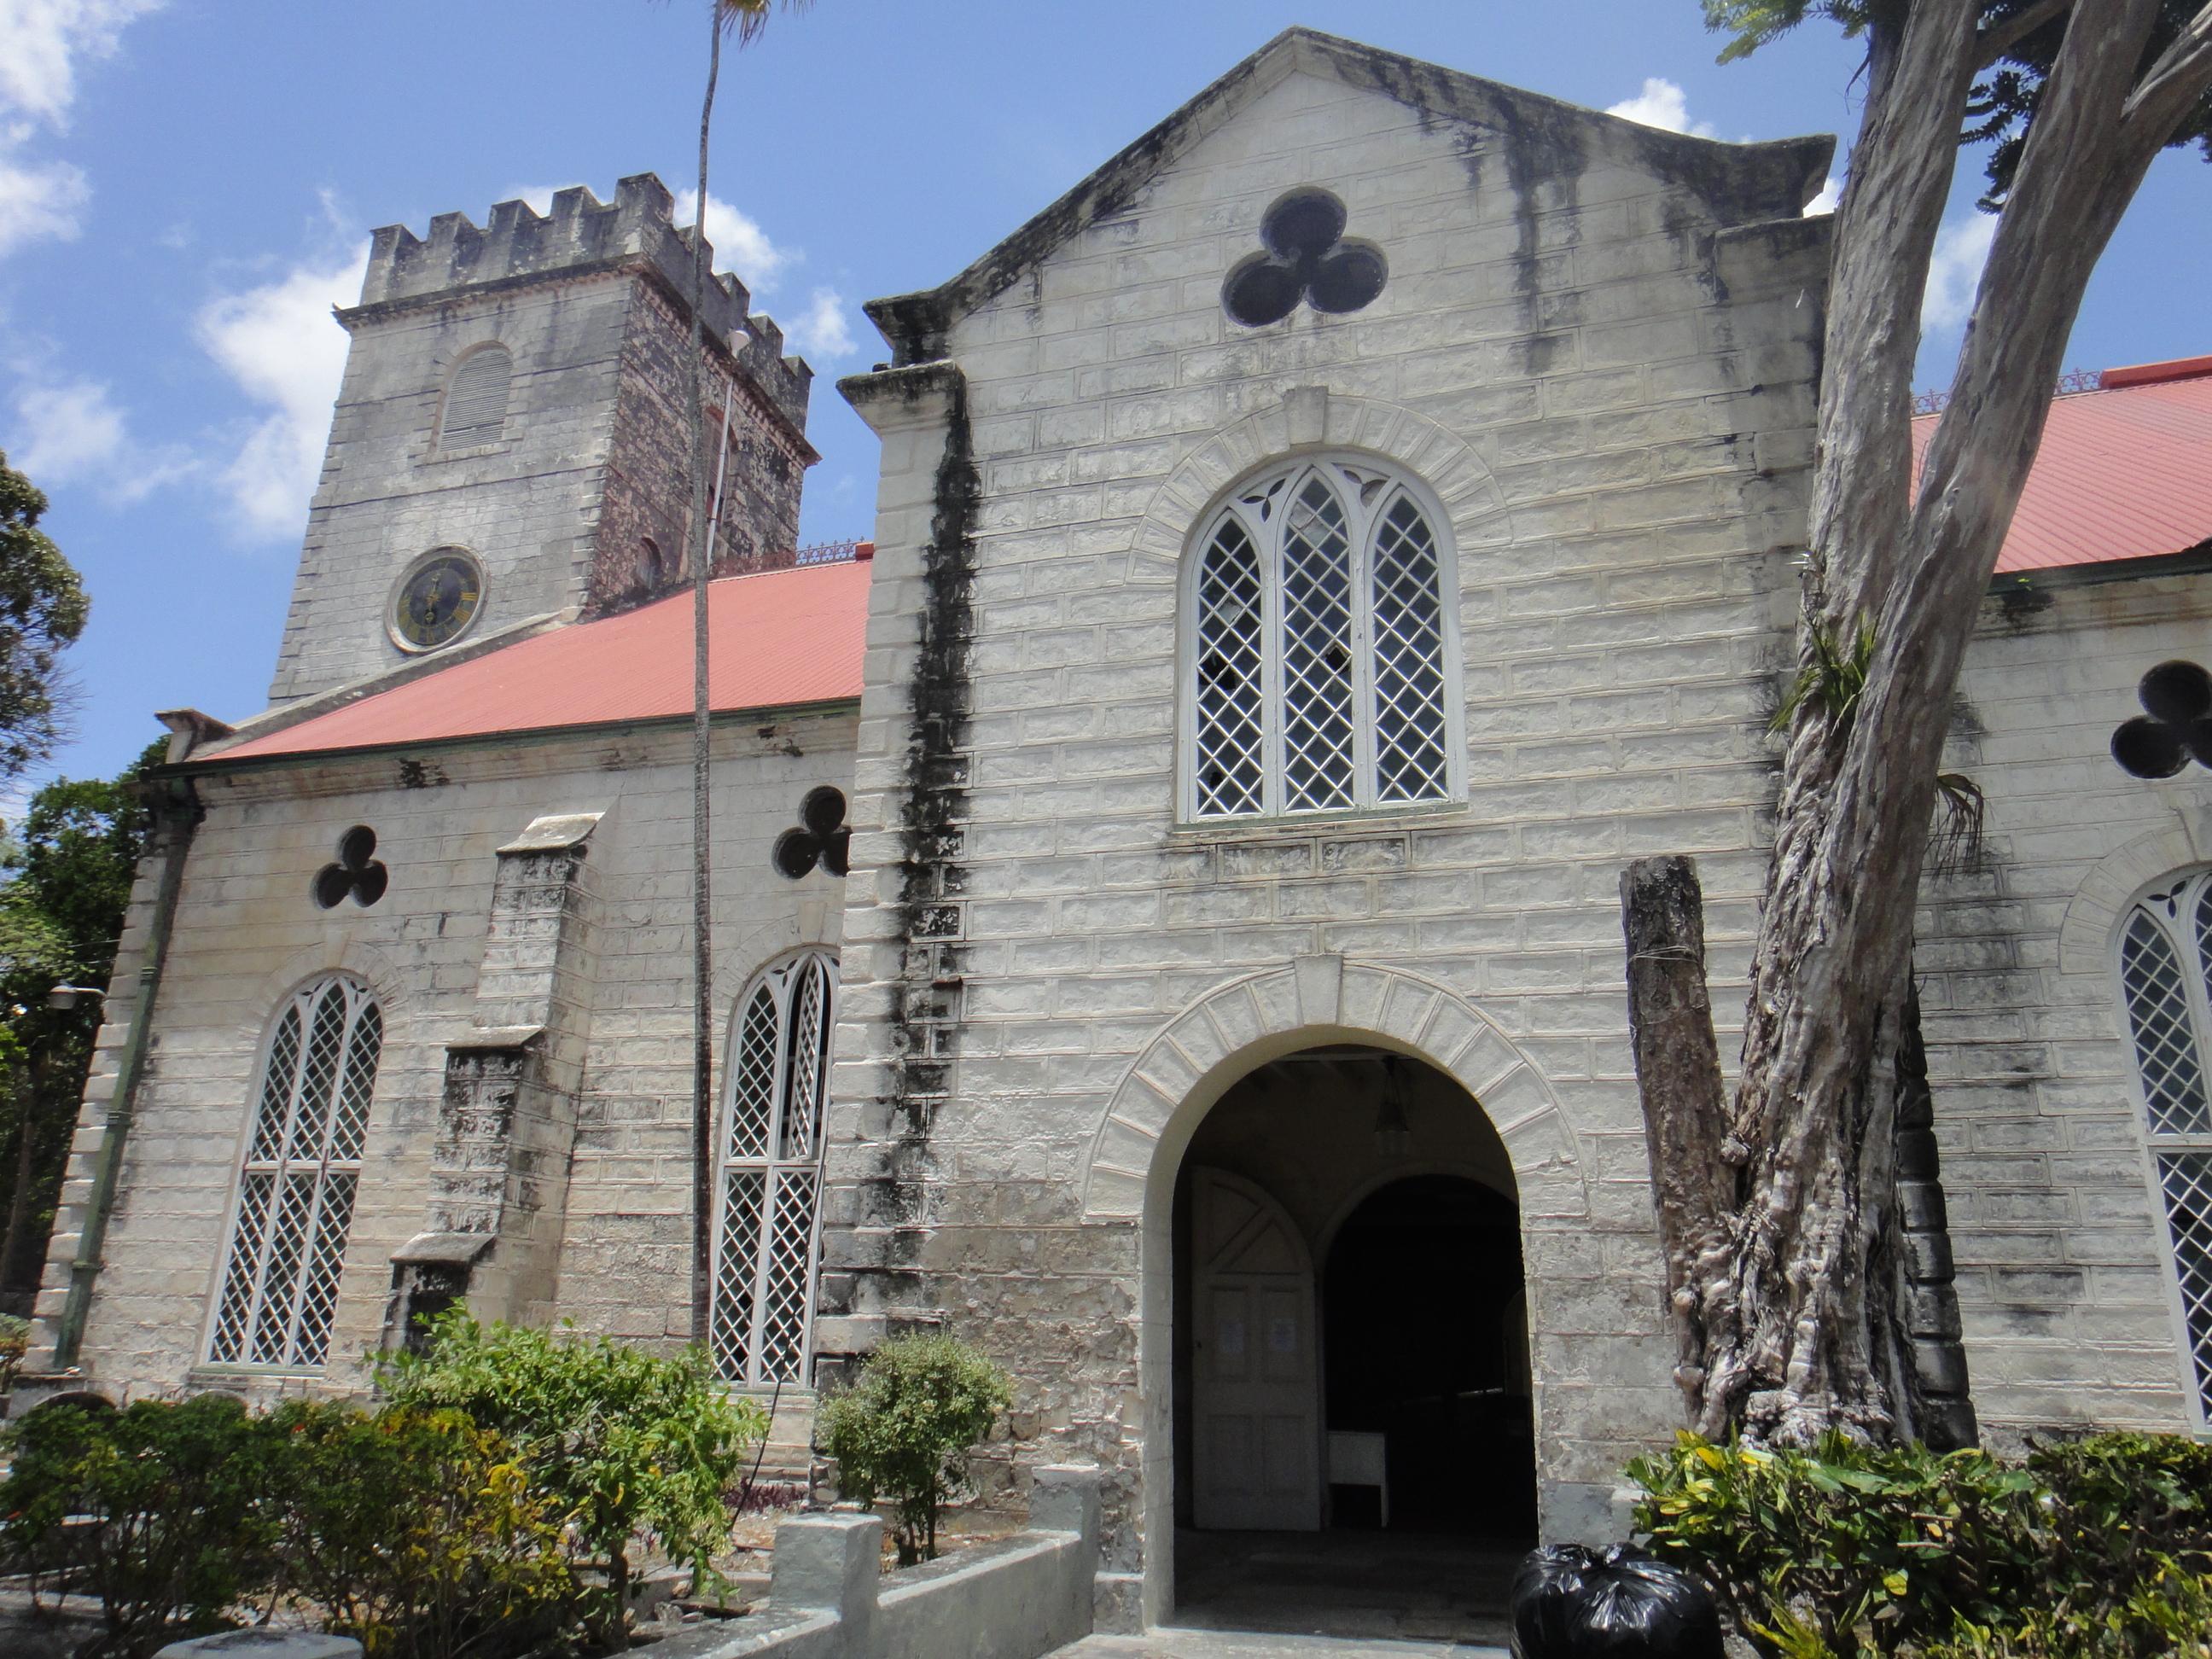 Barbados Wikipedia Karavan Trailer Wiring Diagram Custom Religionedit